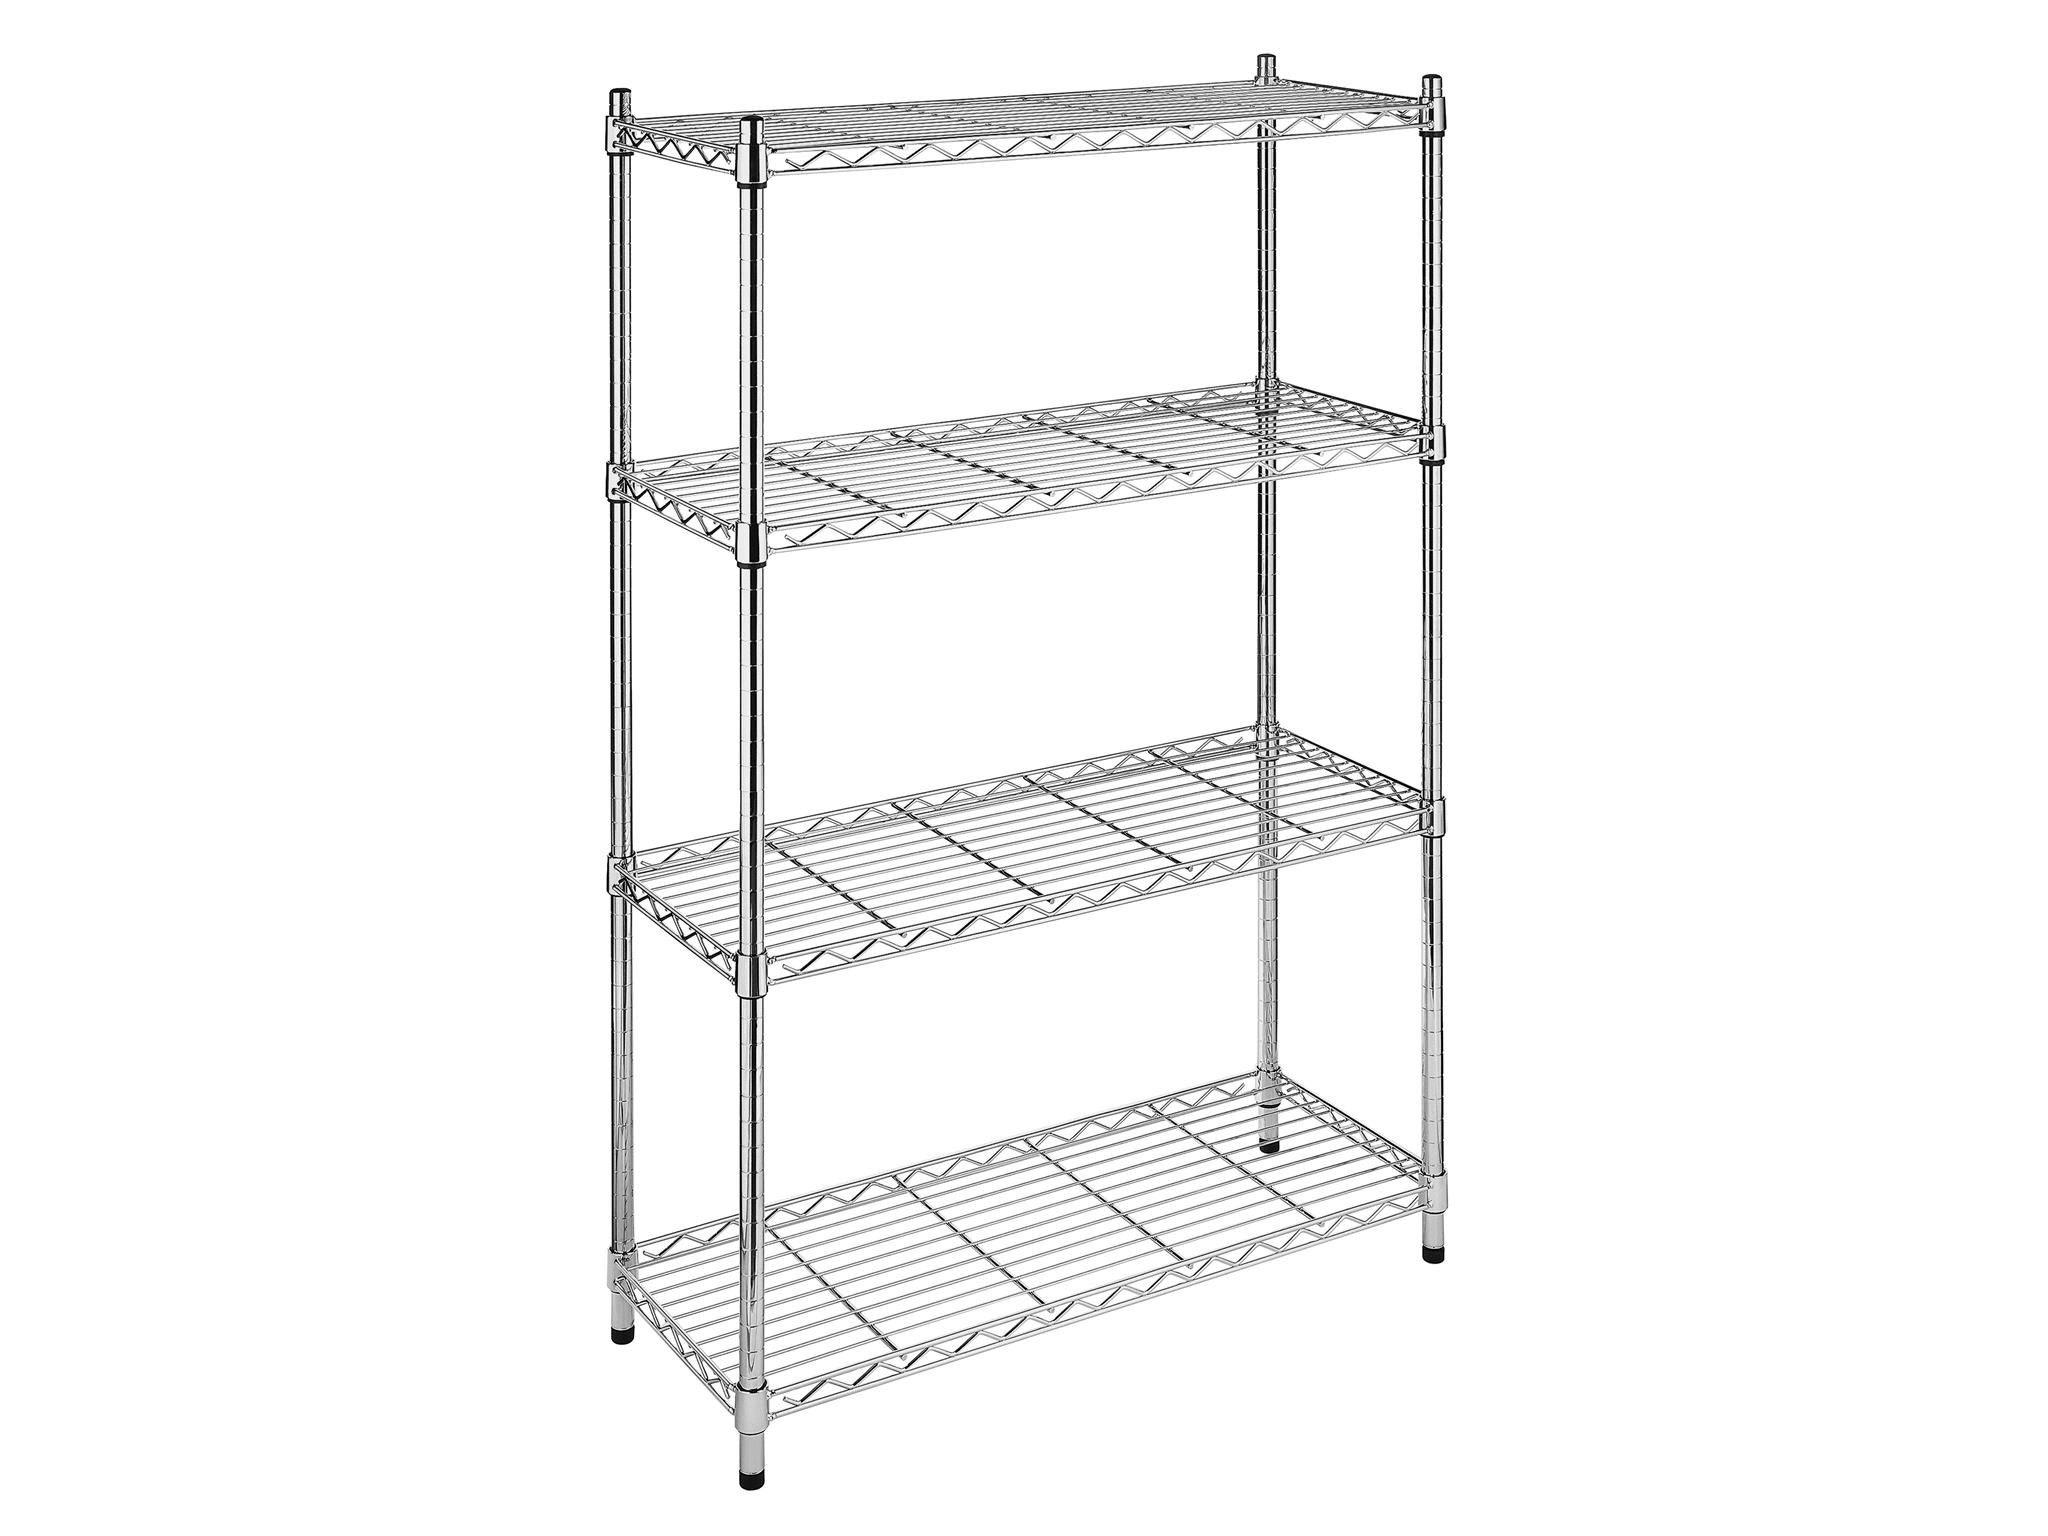 Whitmor Supreme 4-Tier Wire Shelving Unit Chrome | Meijer.com